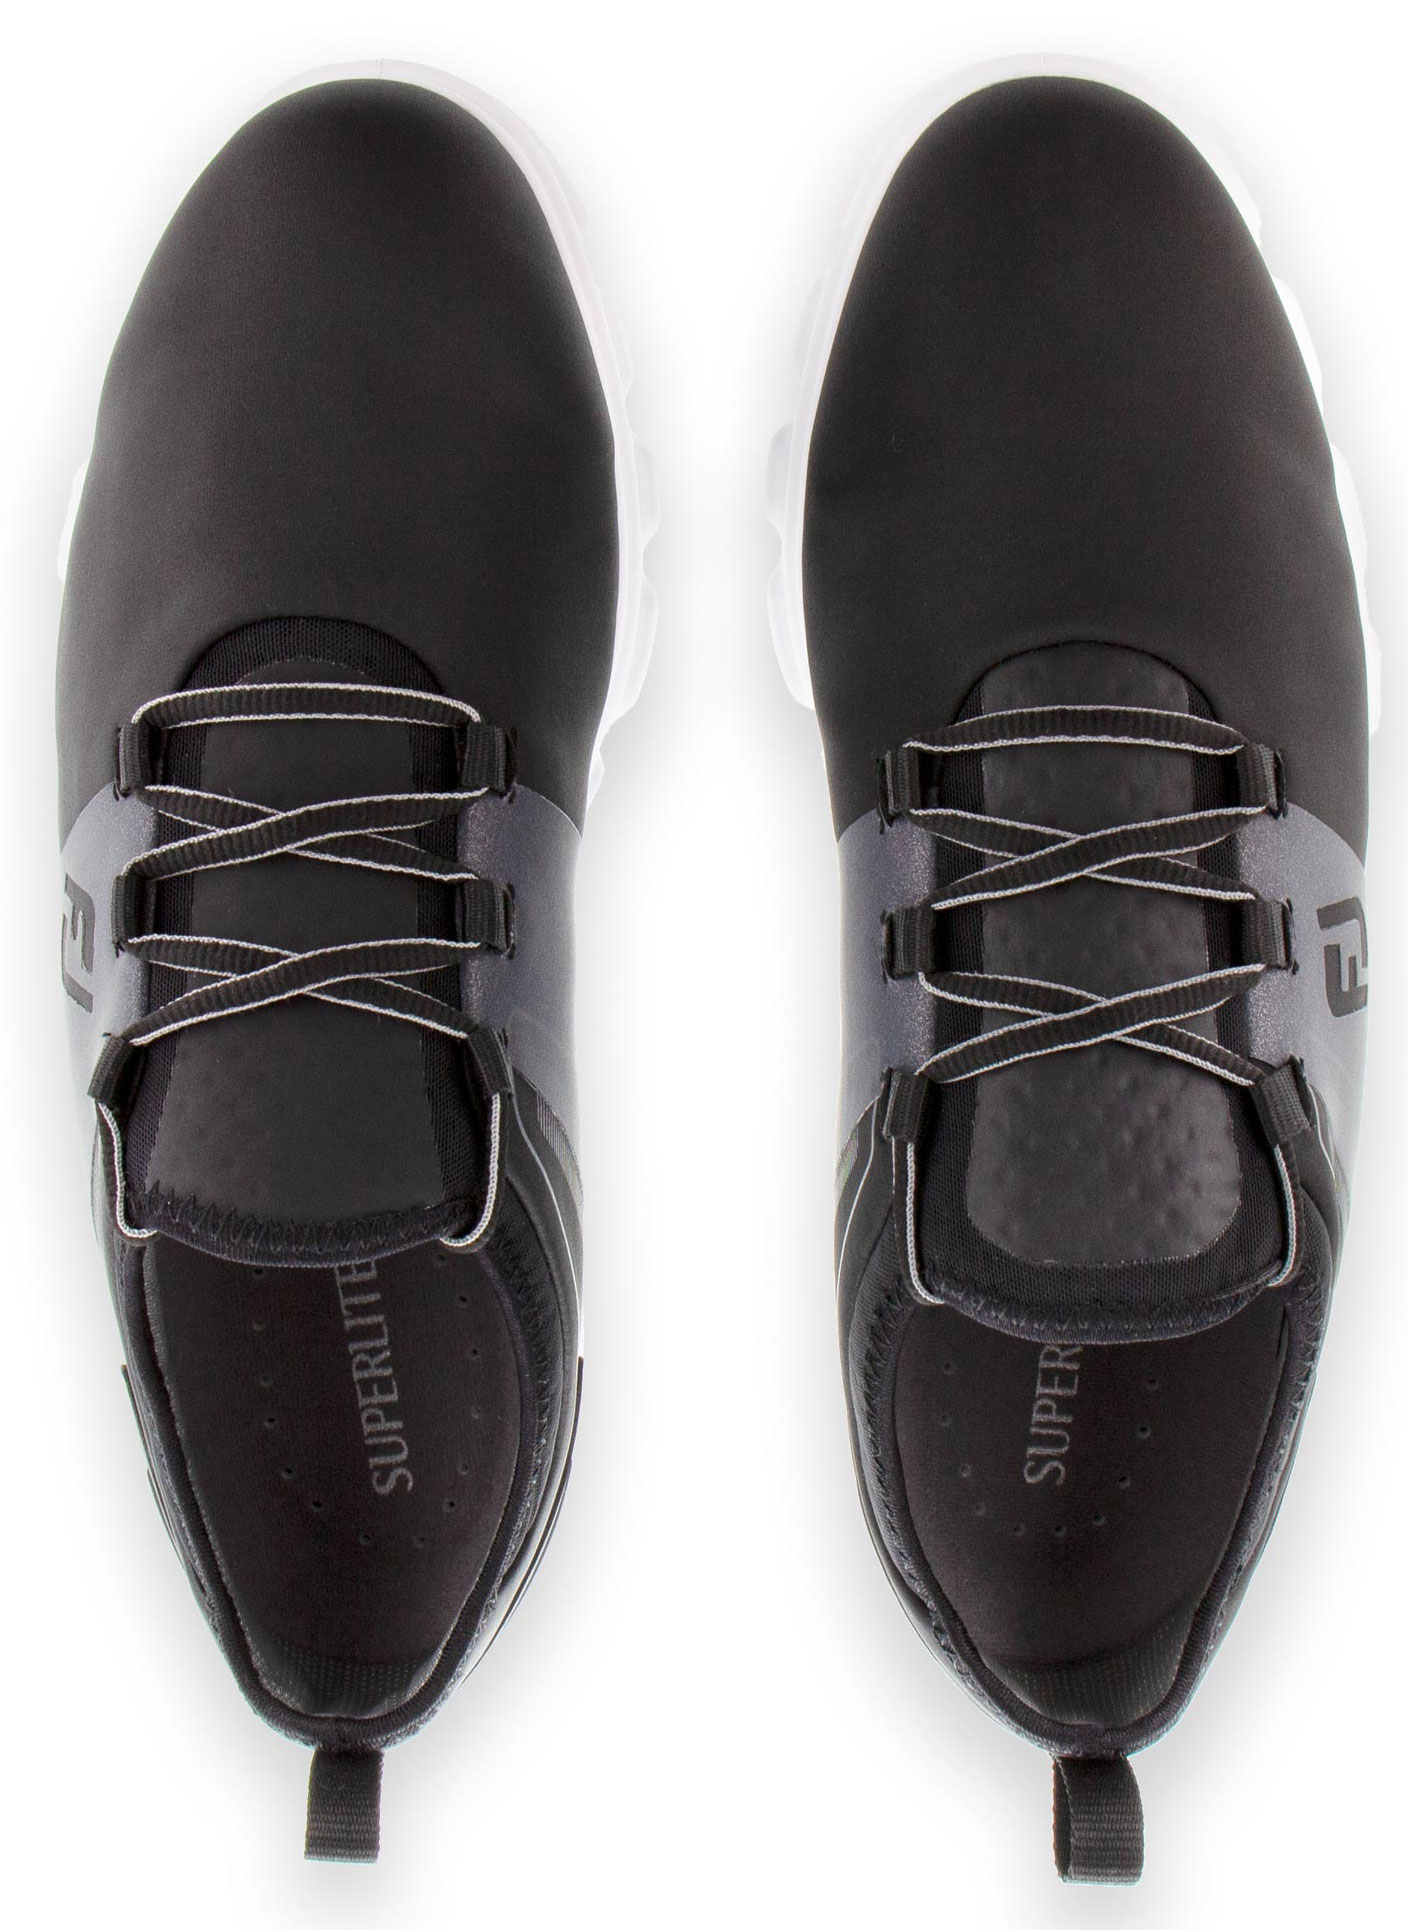 FootJoy-Superlites-XP-Golf-Shoes-Men-039-s-New thumbnail 5